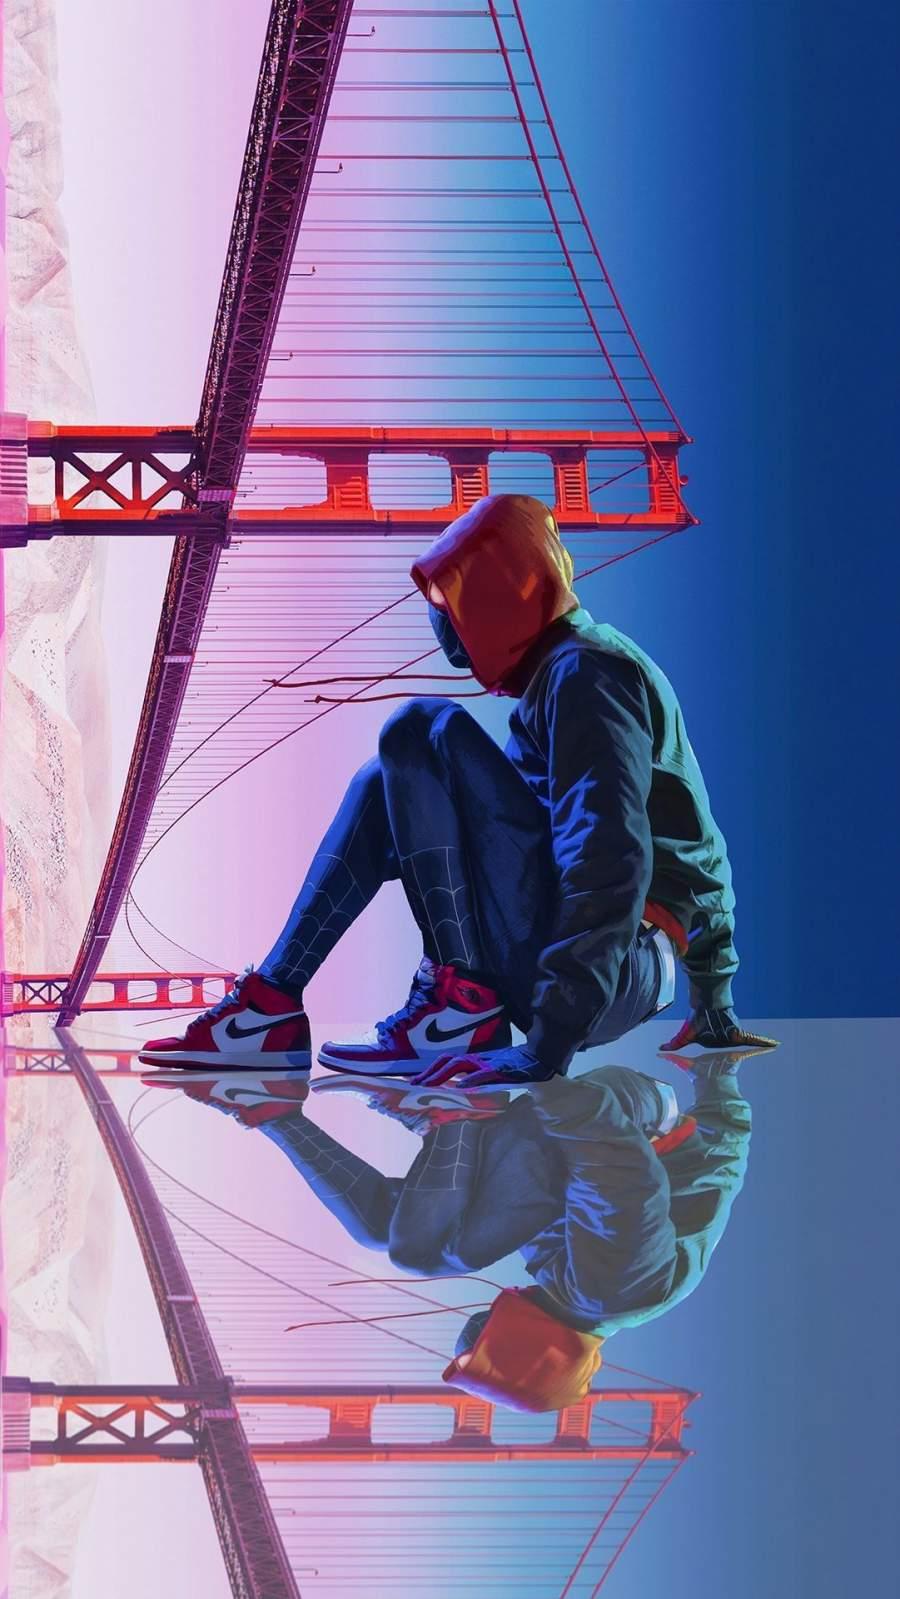 Spiderman Golden Gate Bridge iPhone Wallpaper